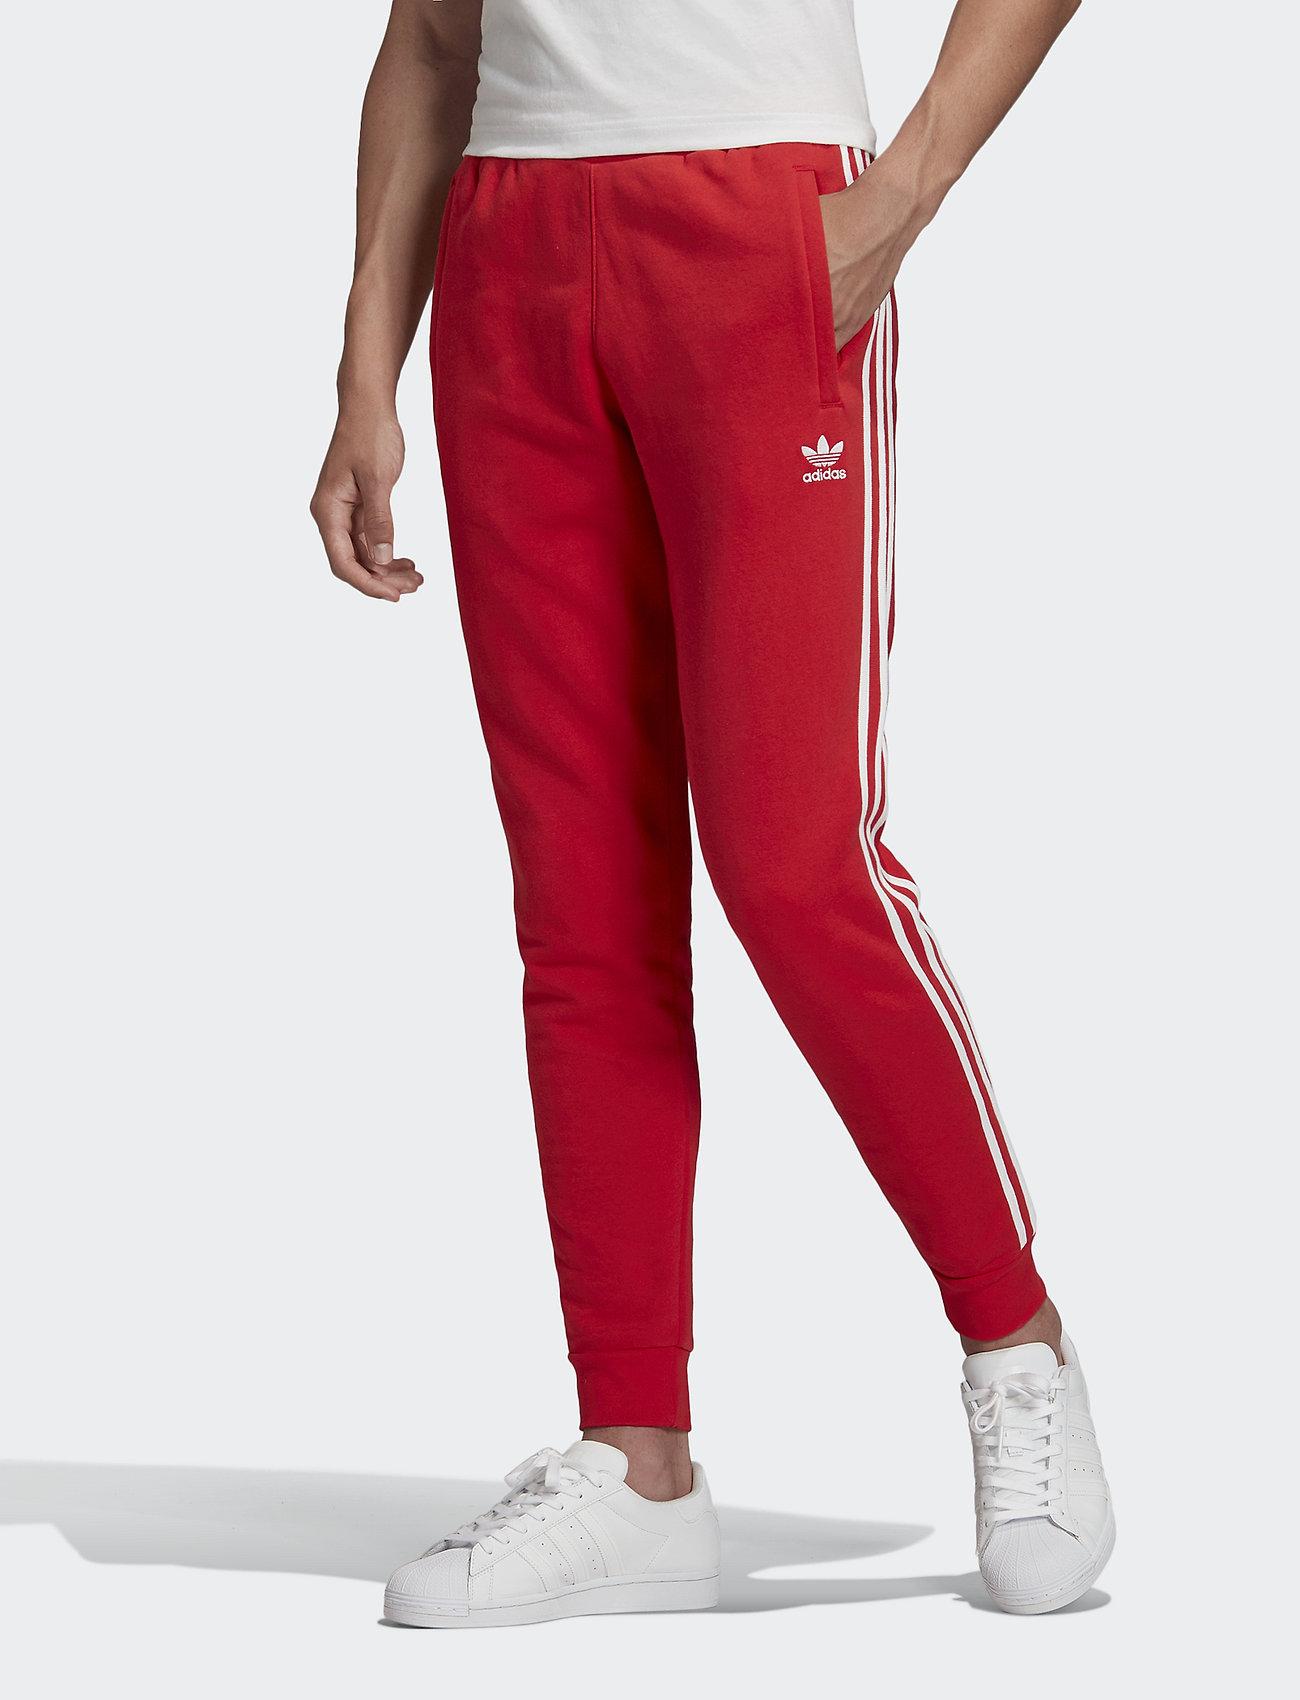 adidas Originals - 3-STRIPES PANT - pants - lusred - 0